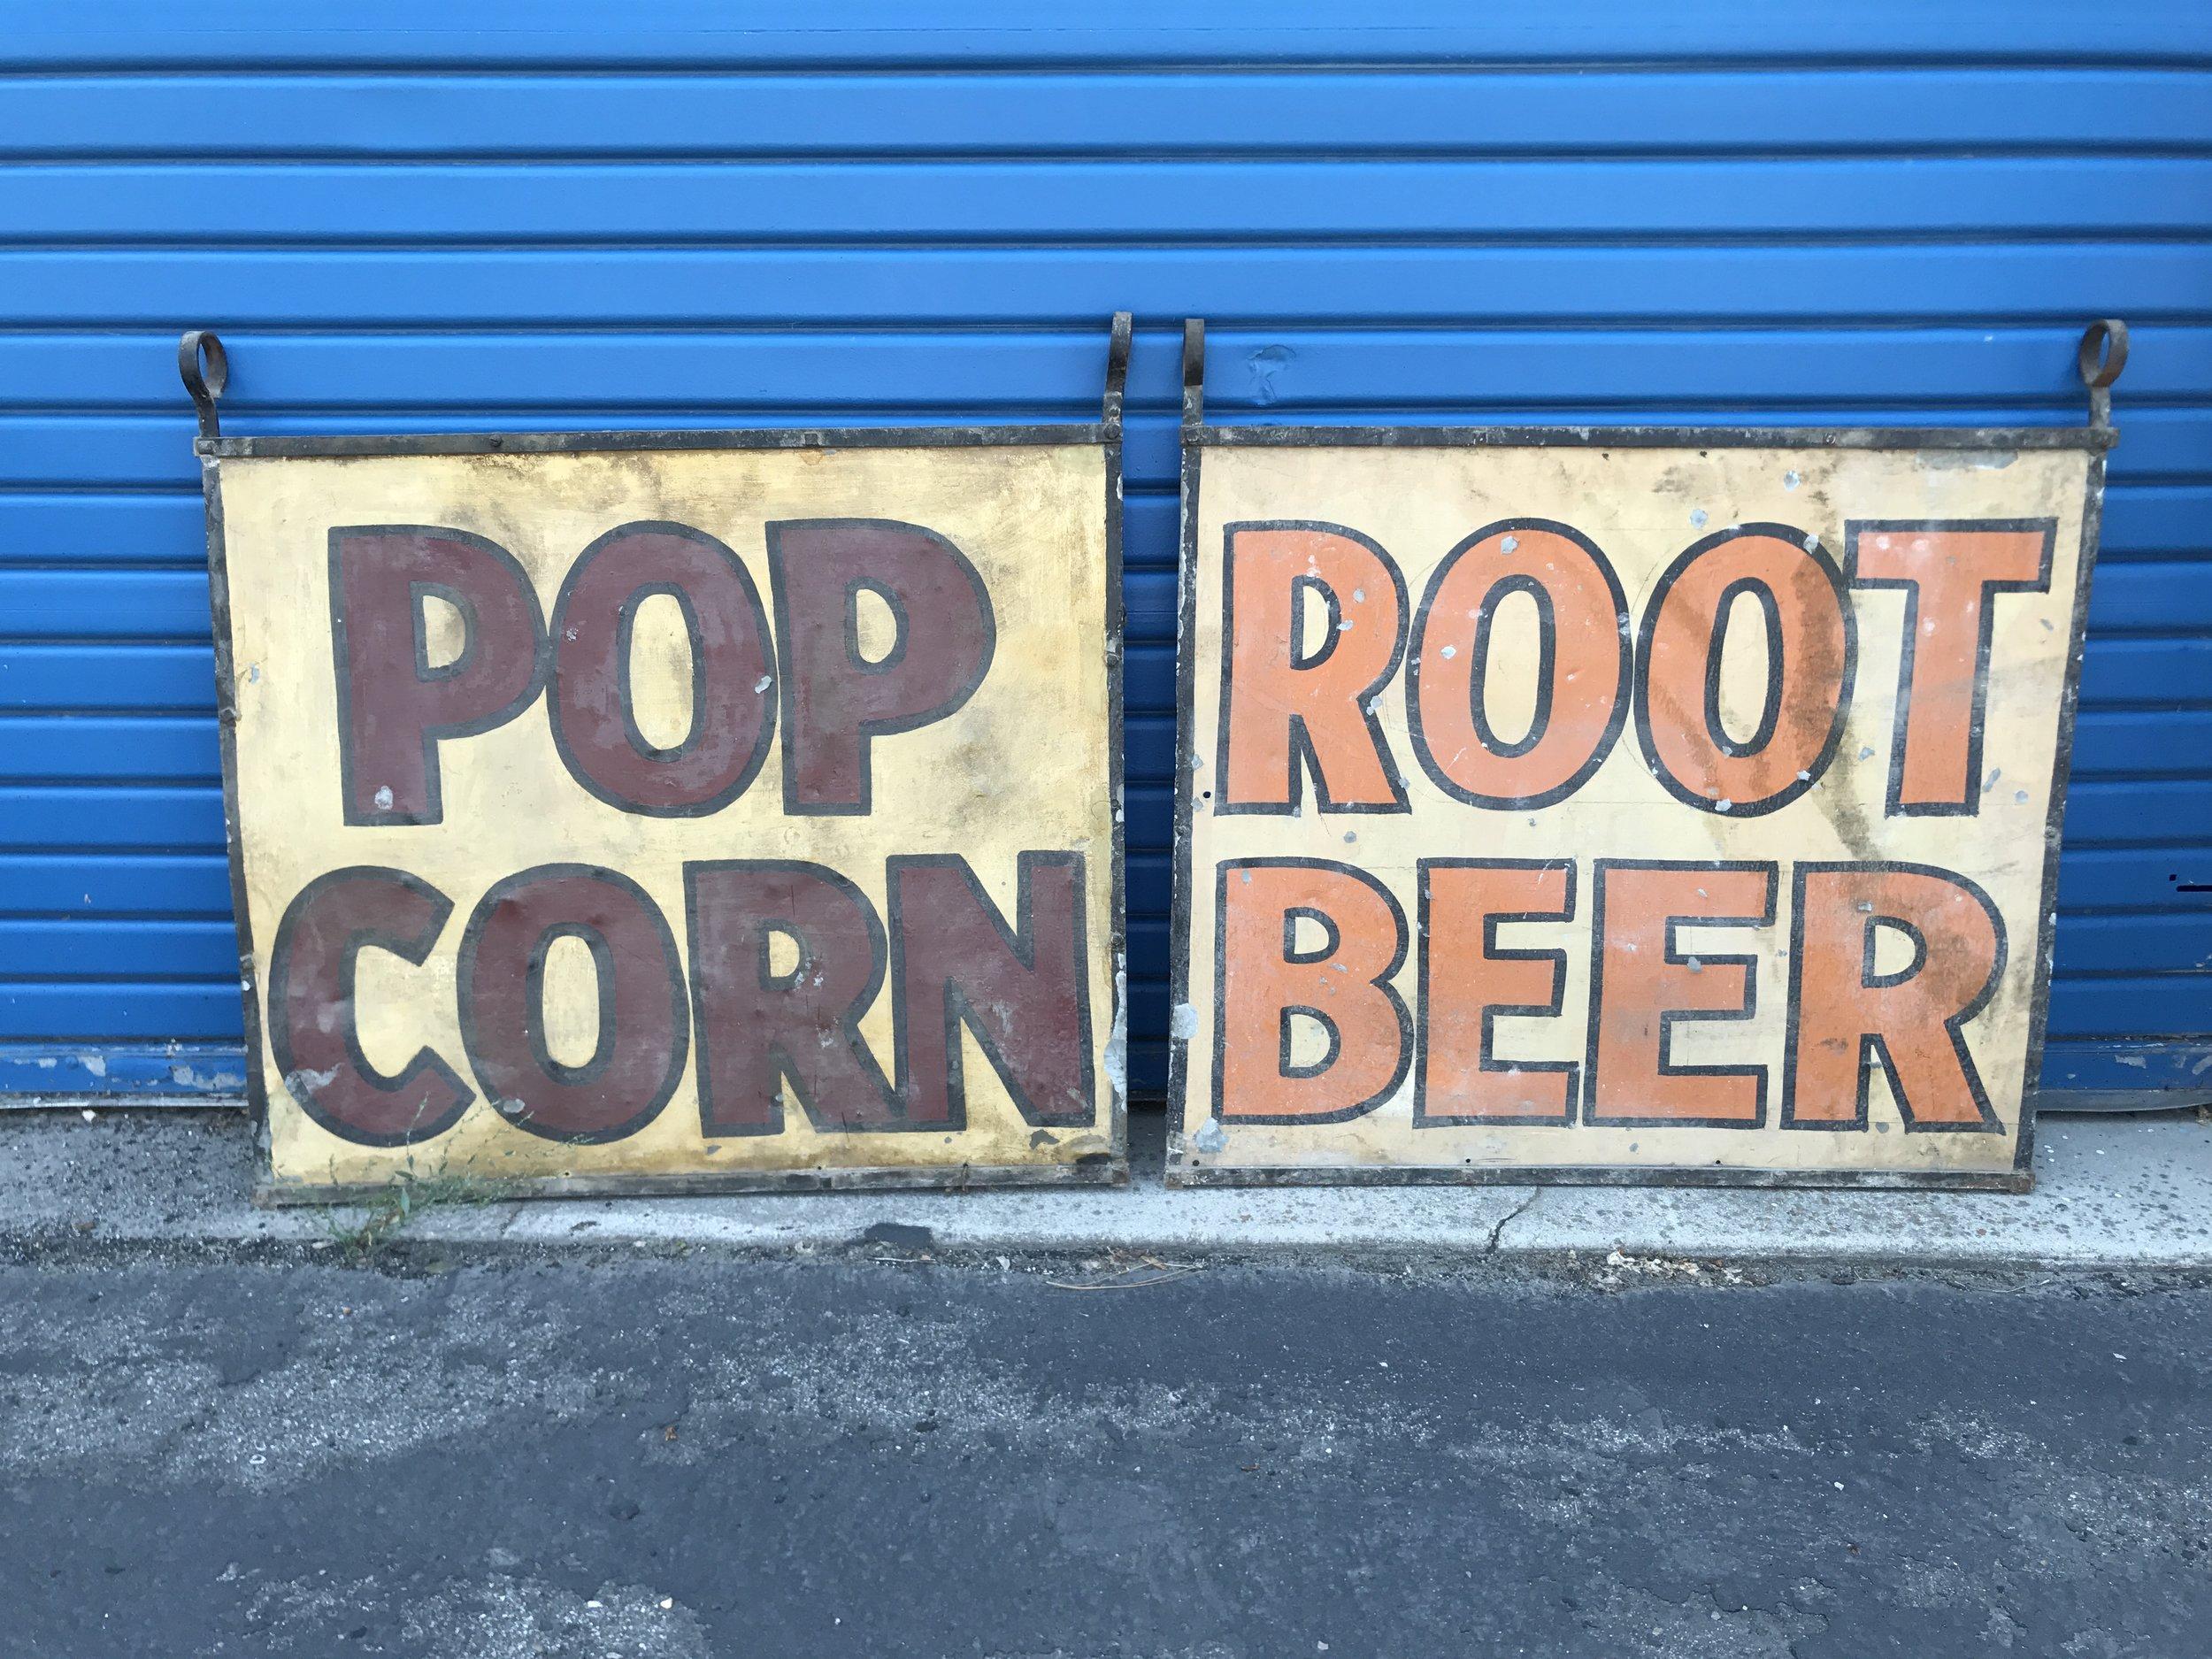 LISA Popcorn/Popcorn RootBeer/Popcorn